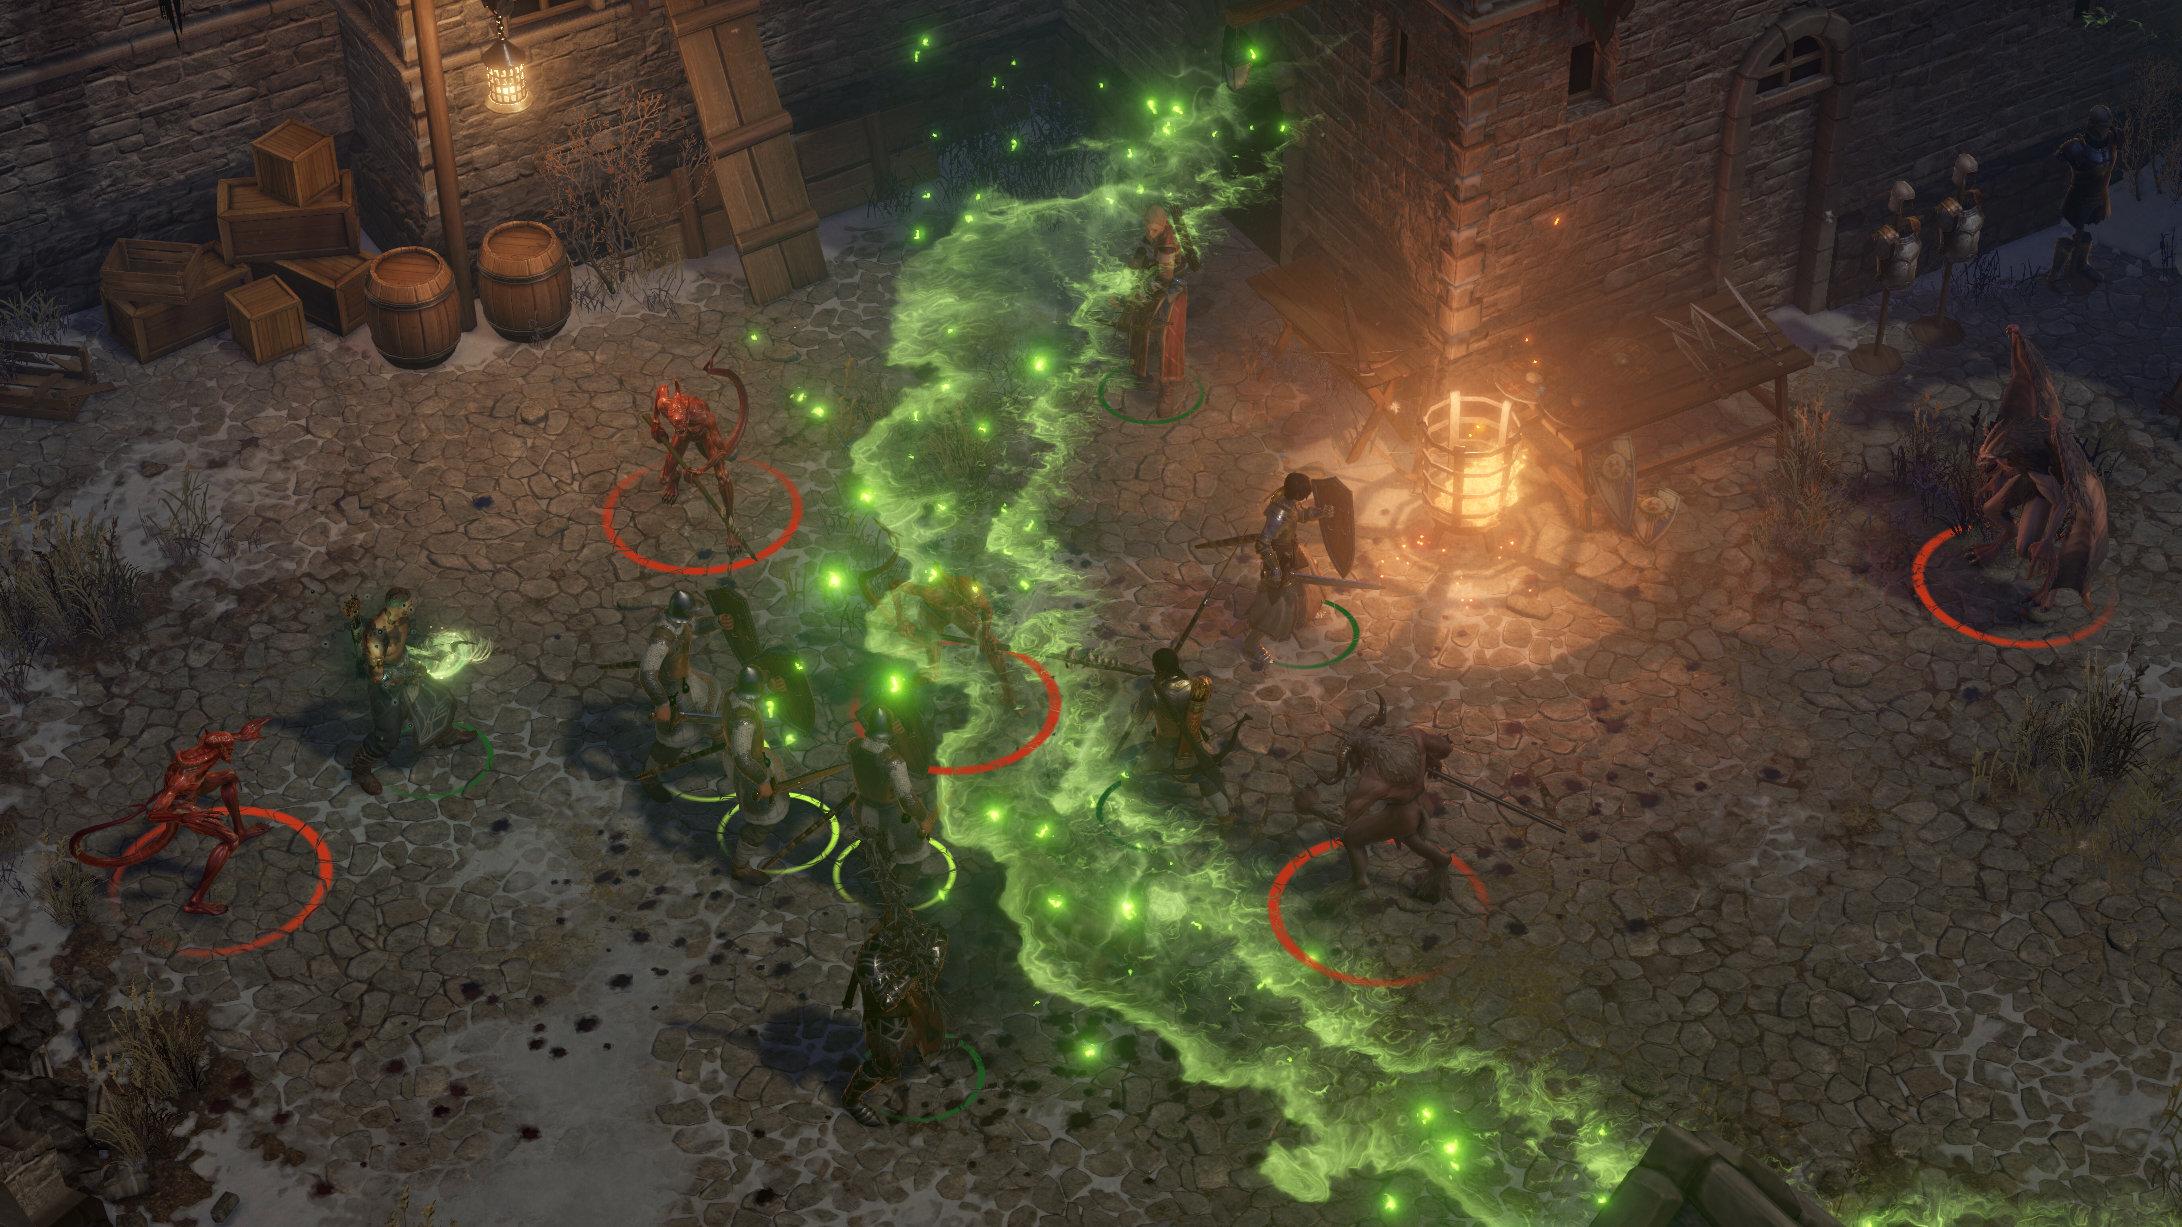 Pathfinder: Wrath of the Righteous hit its Kickstarter goal | Rock Paper Shotgun